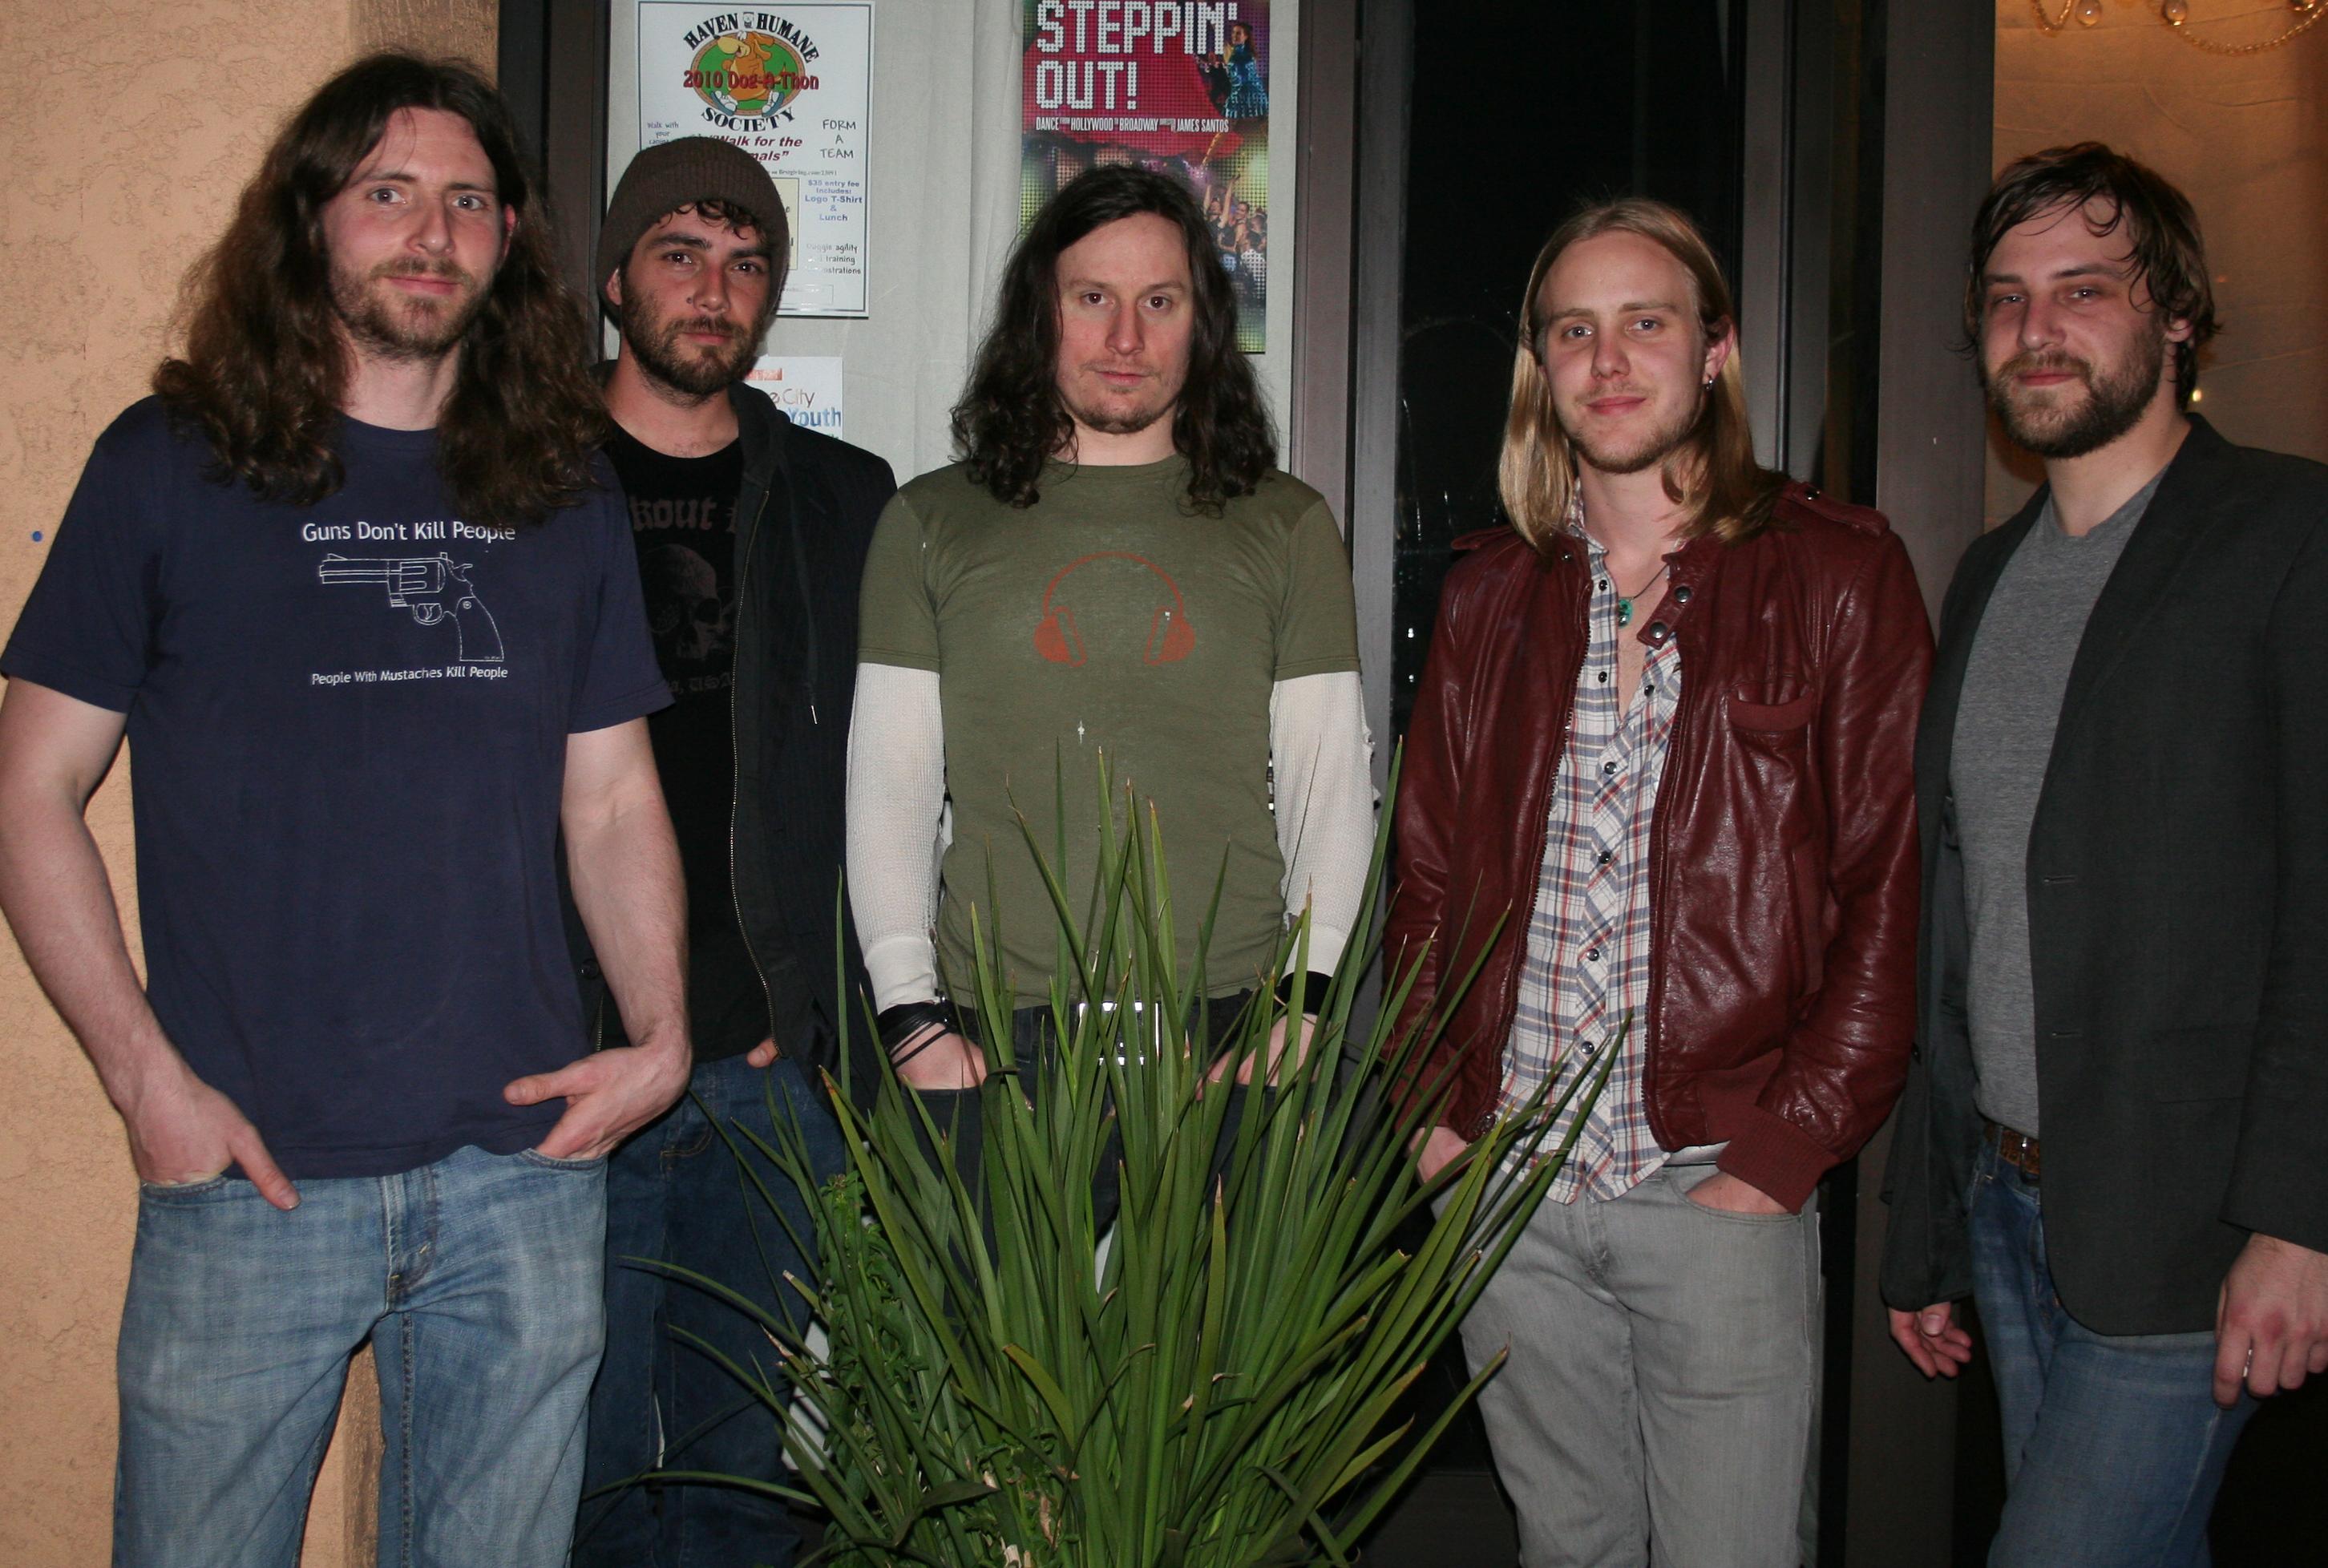 Ape Machine is Caleb Heinze – Vocals, Ian Watts – Guitar, Jimi Miller – Guitar, Brian True – Bass, Damon Delapaz – Drums.